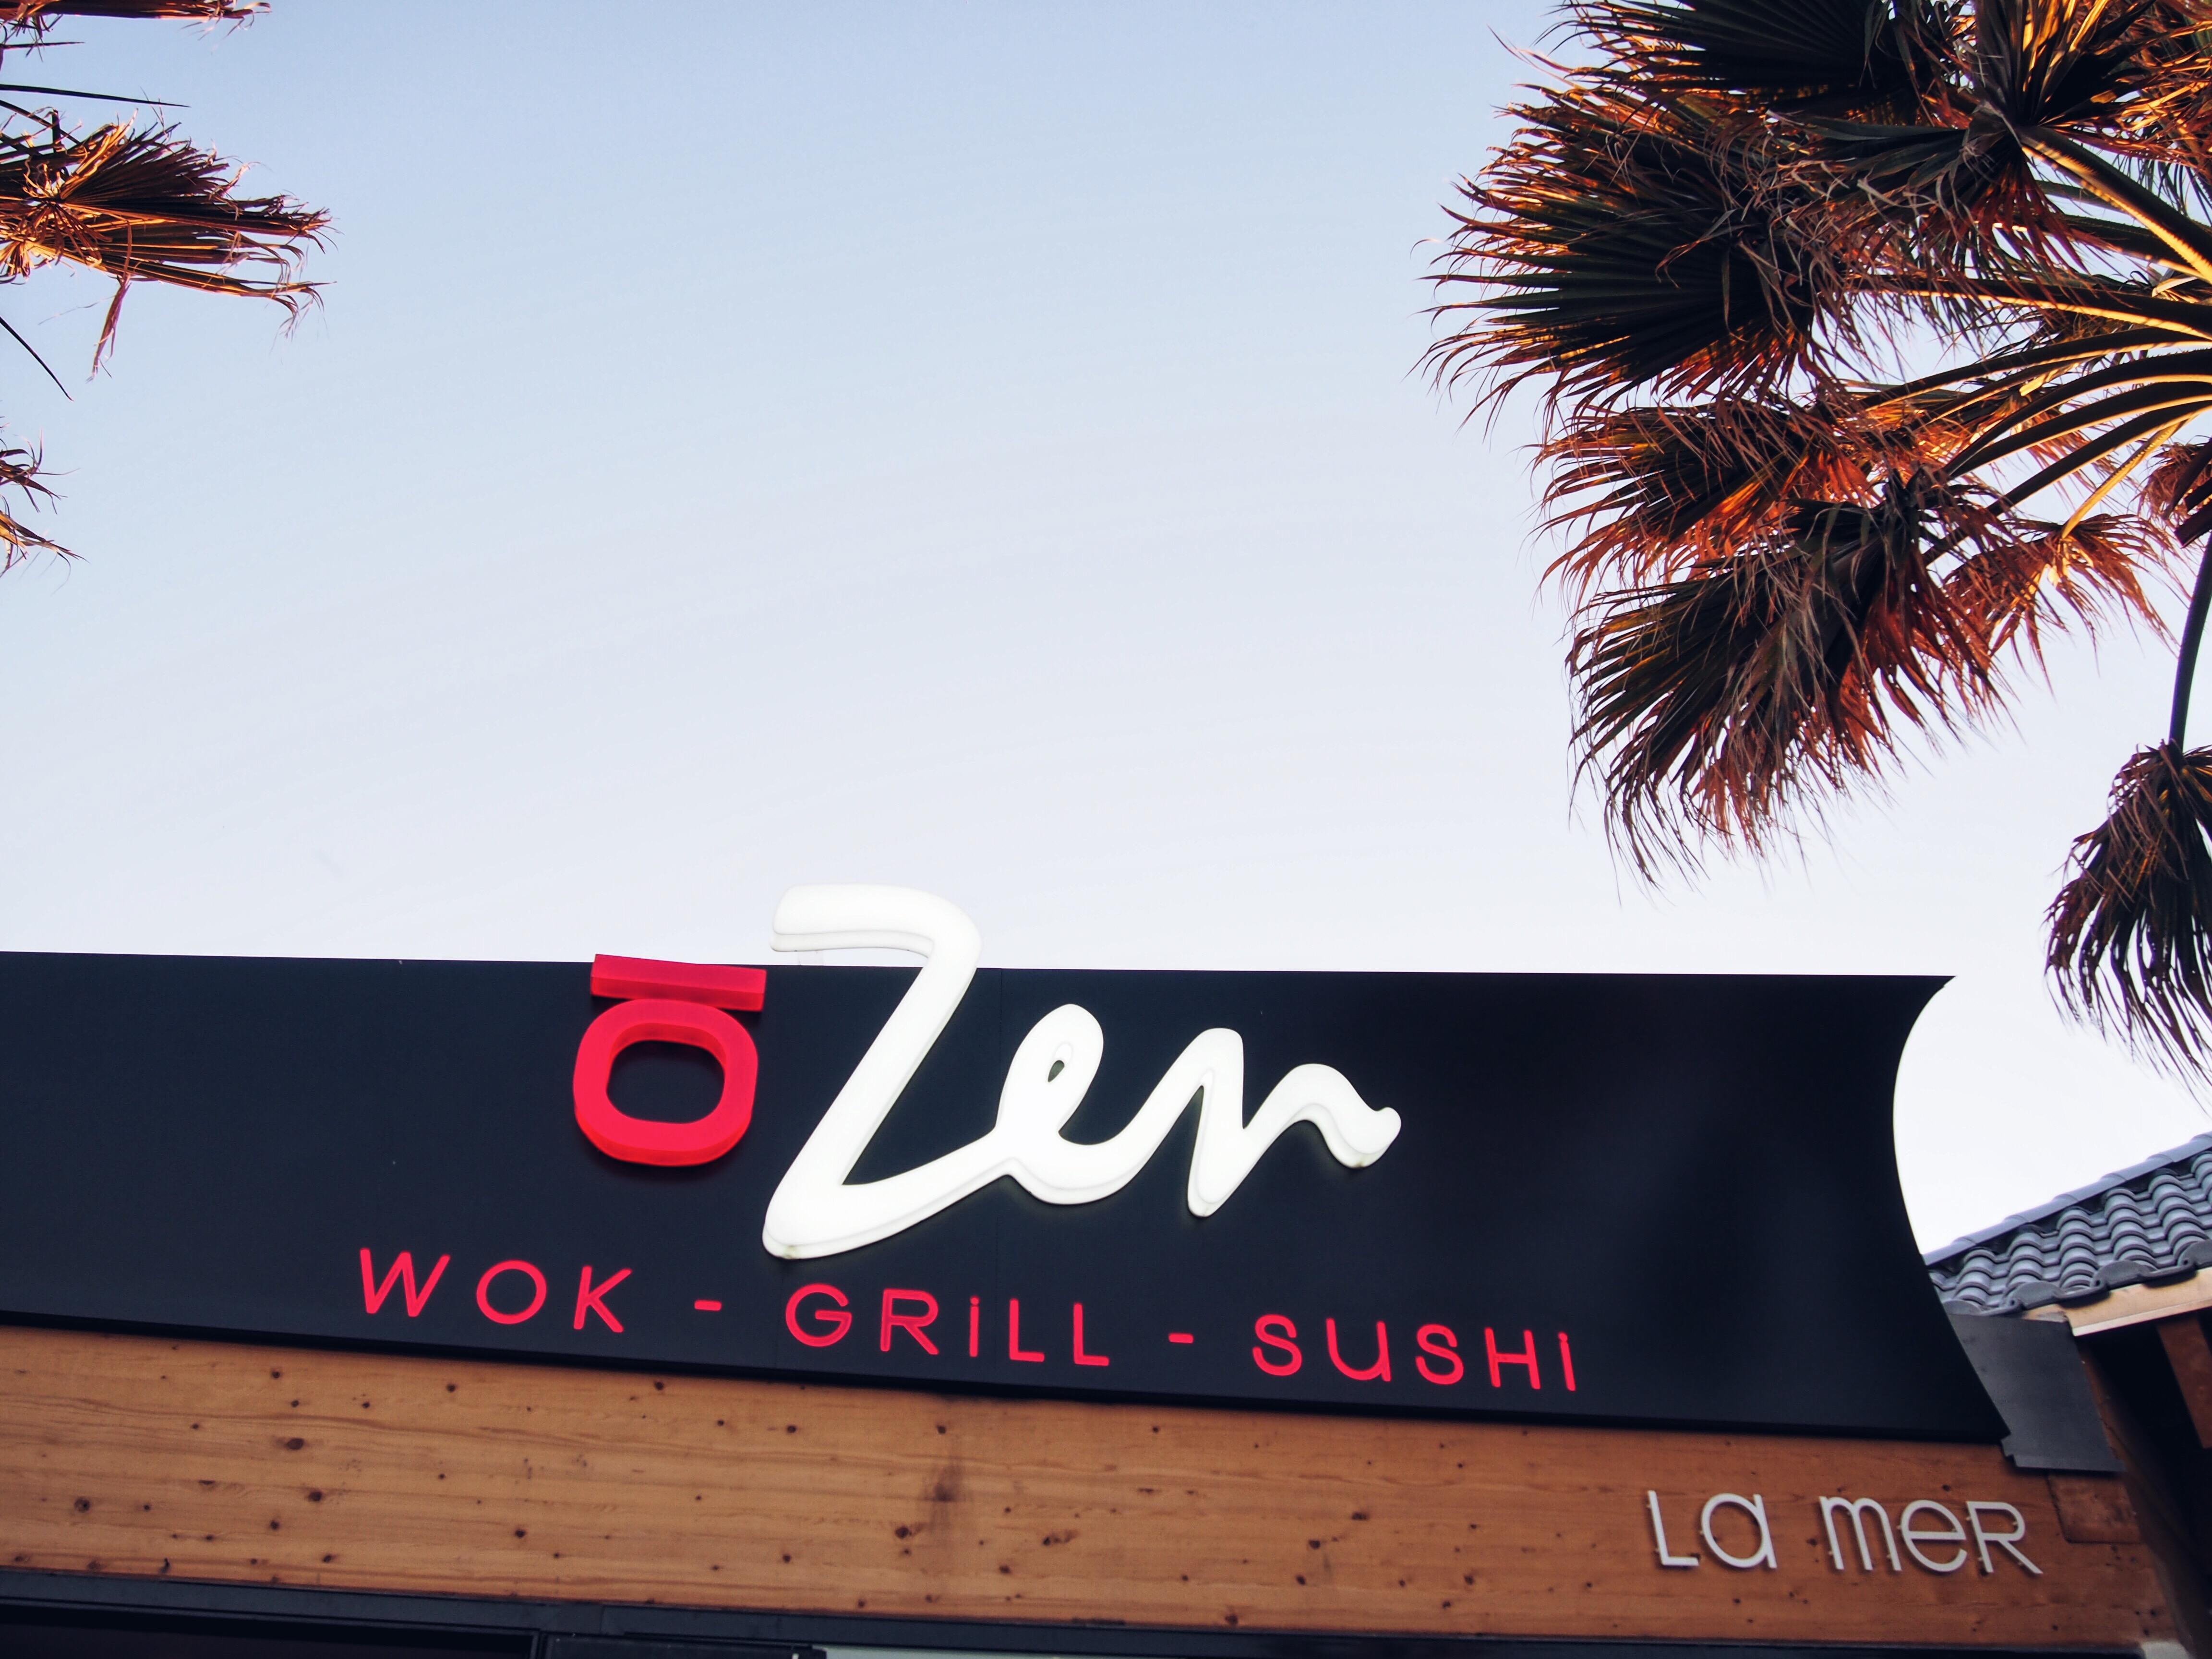 Le O'Zen – Wok, Grill, Sushi